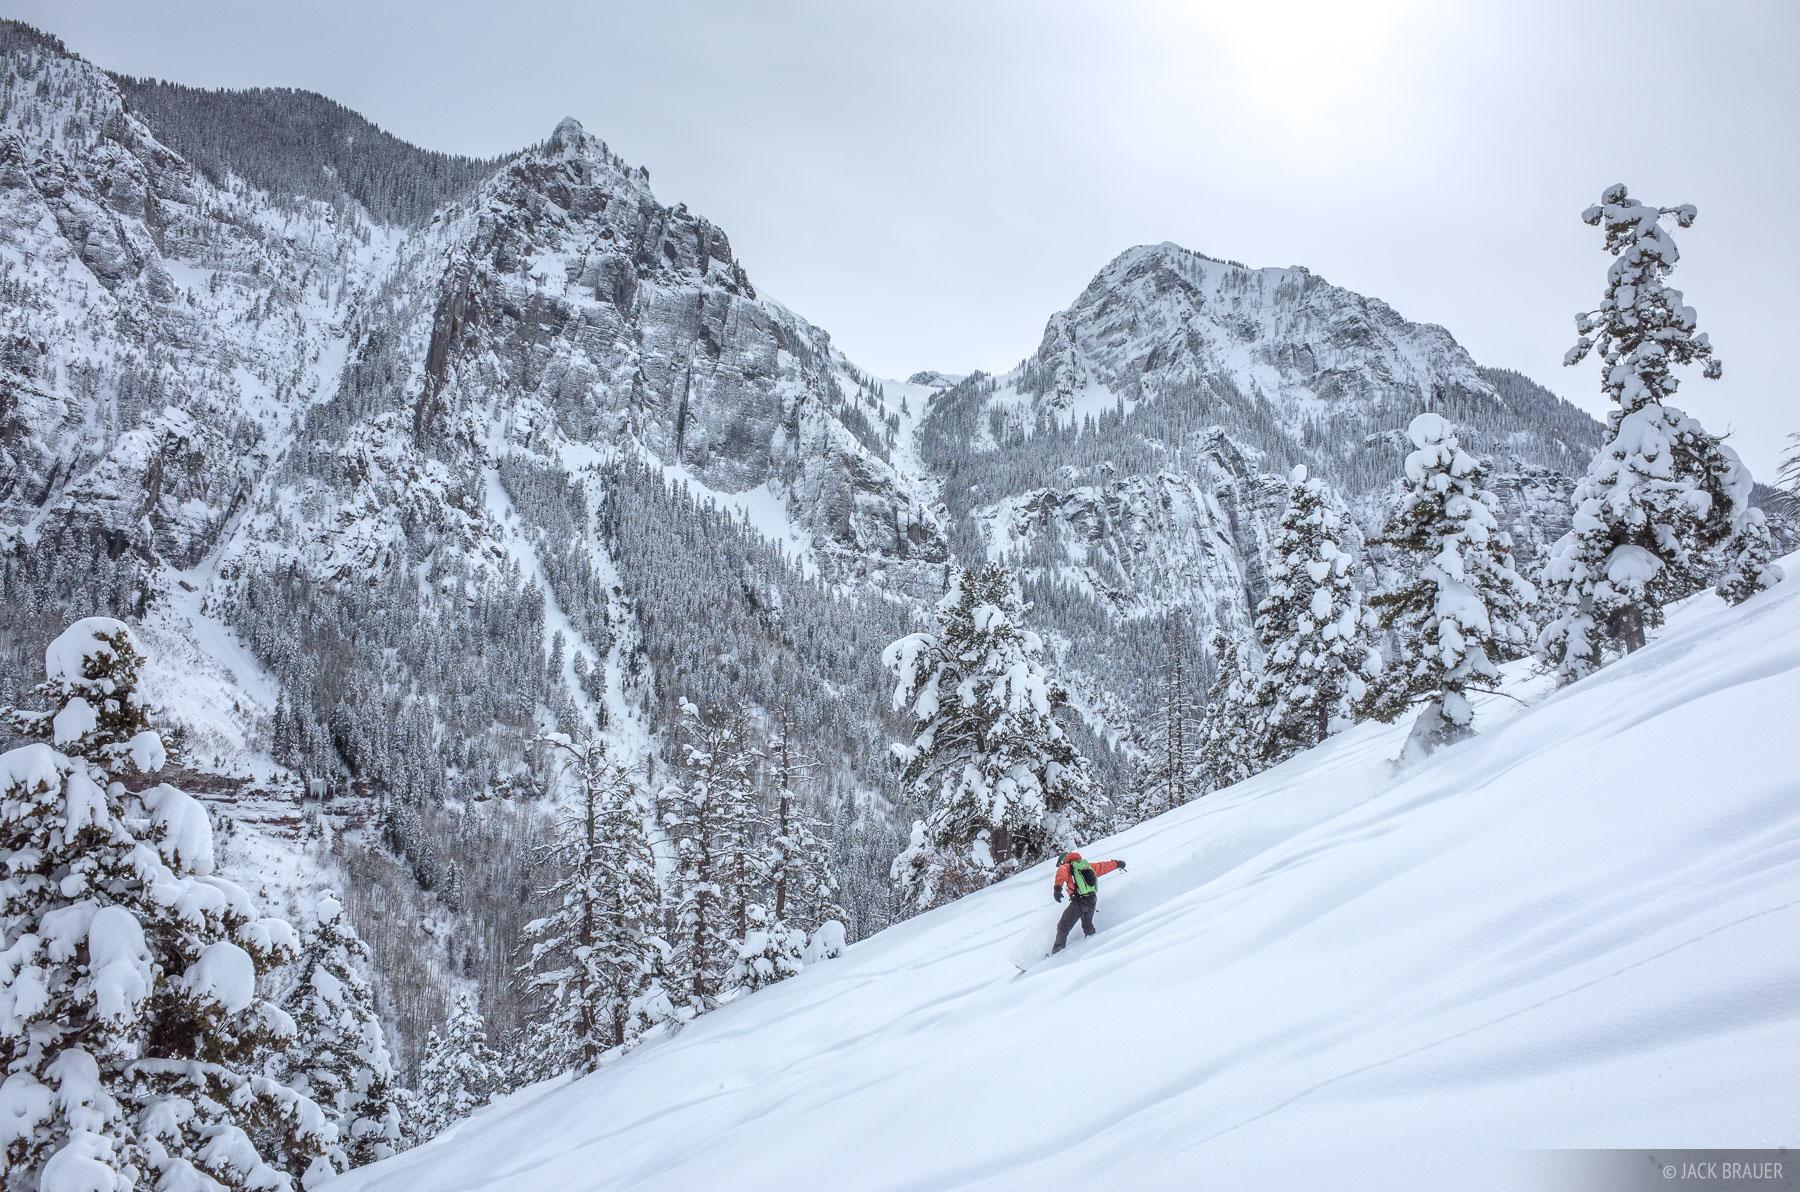 Colorado, San Juan Mountains, Weehawken, skiing, February, powder, photo